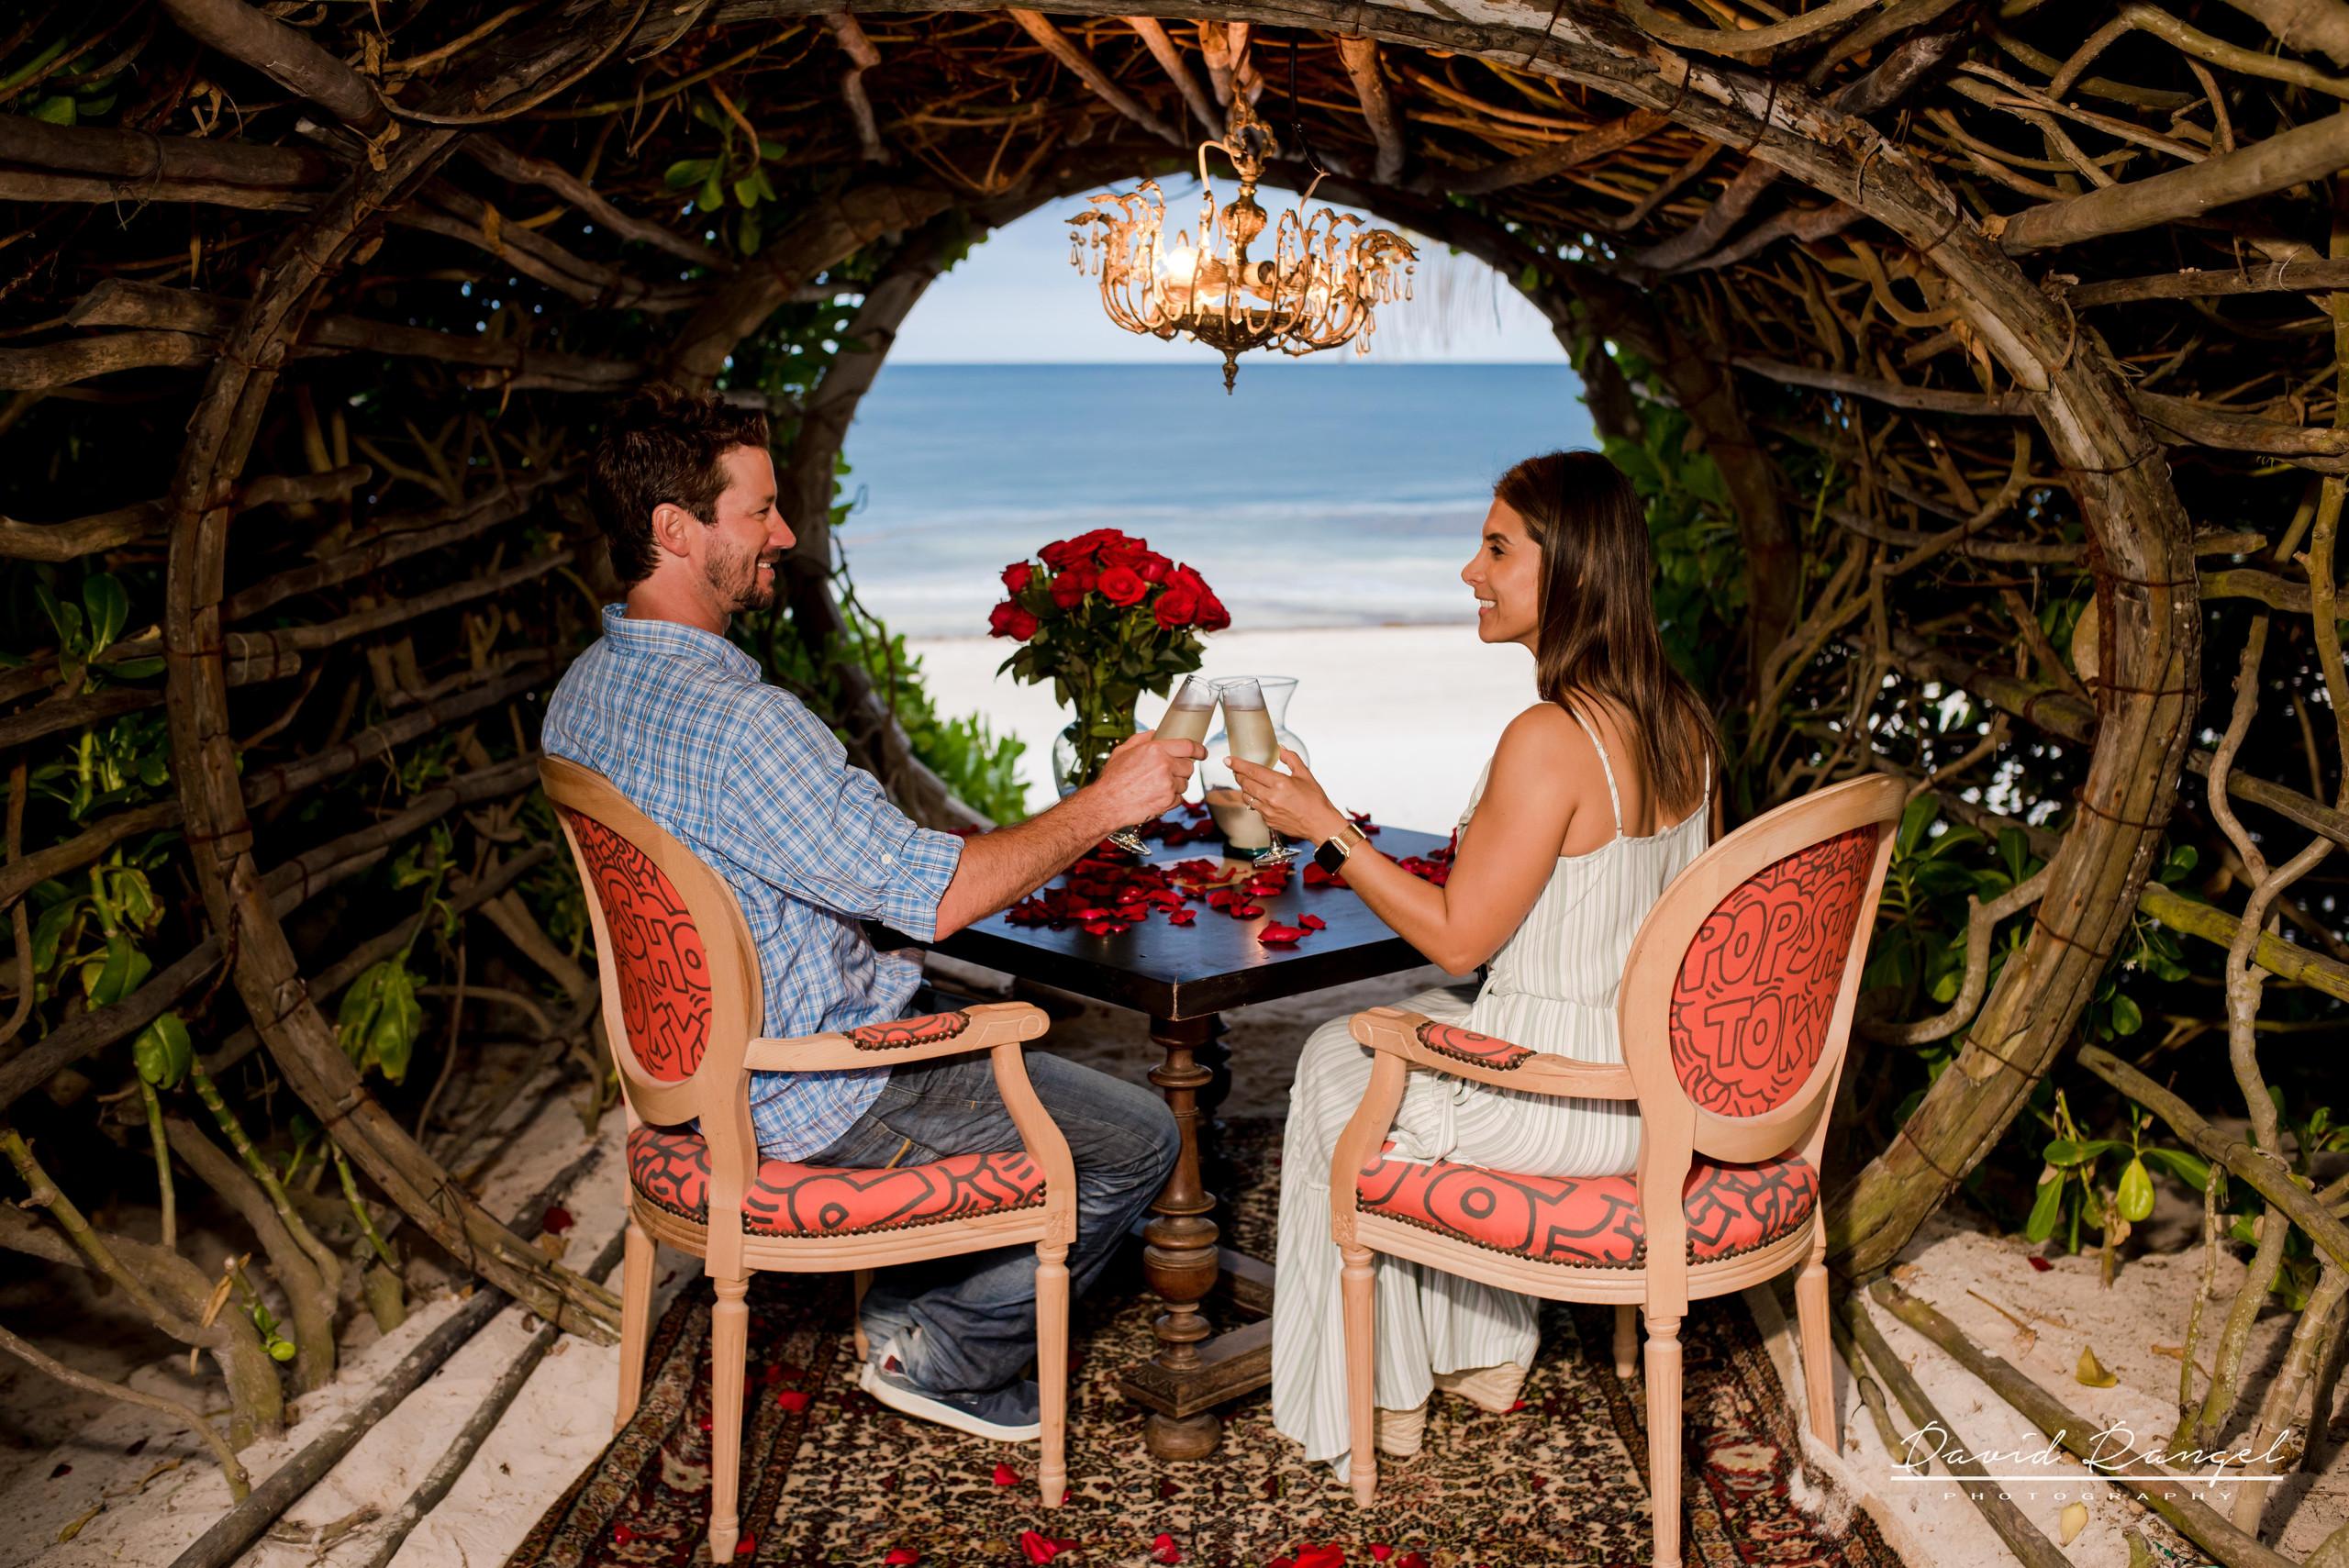 engagement+session+ring+sorprise+beach+vacations+casa+malca+hotel+pedida+de+mano+propuesta+de+matrimonio+pareja+amor+photo+boutique+romantic+dinner